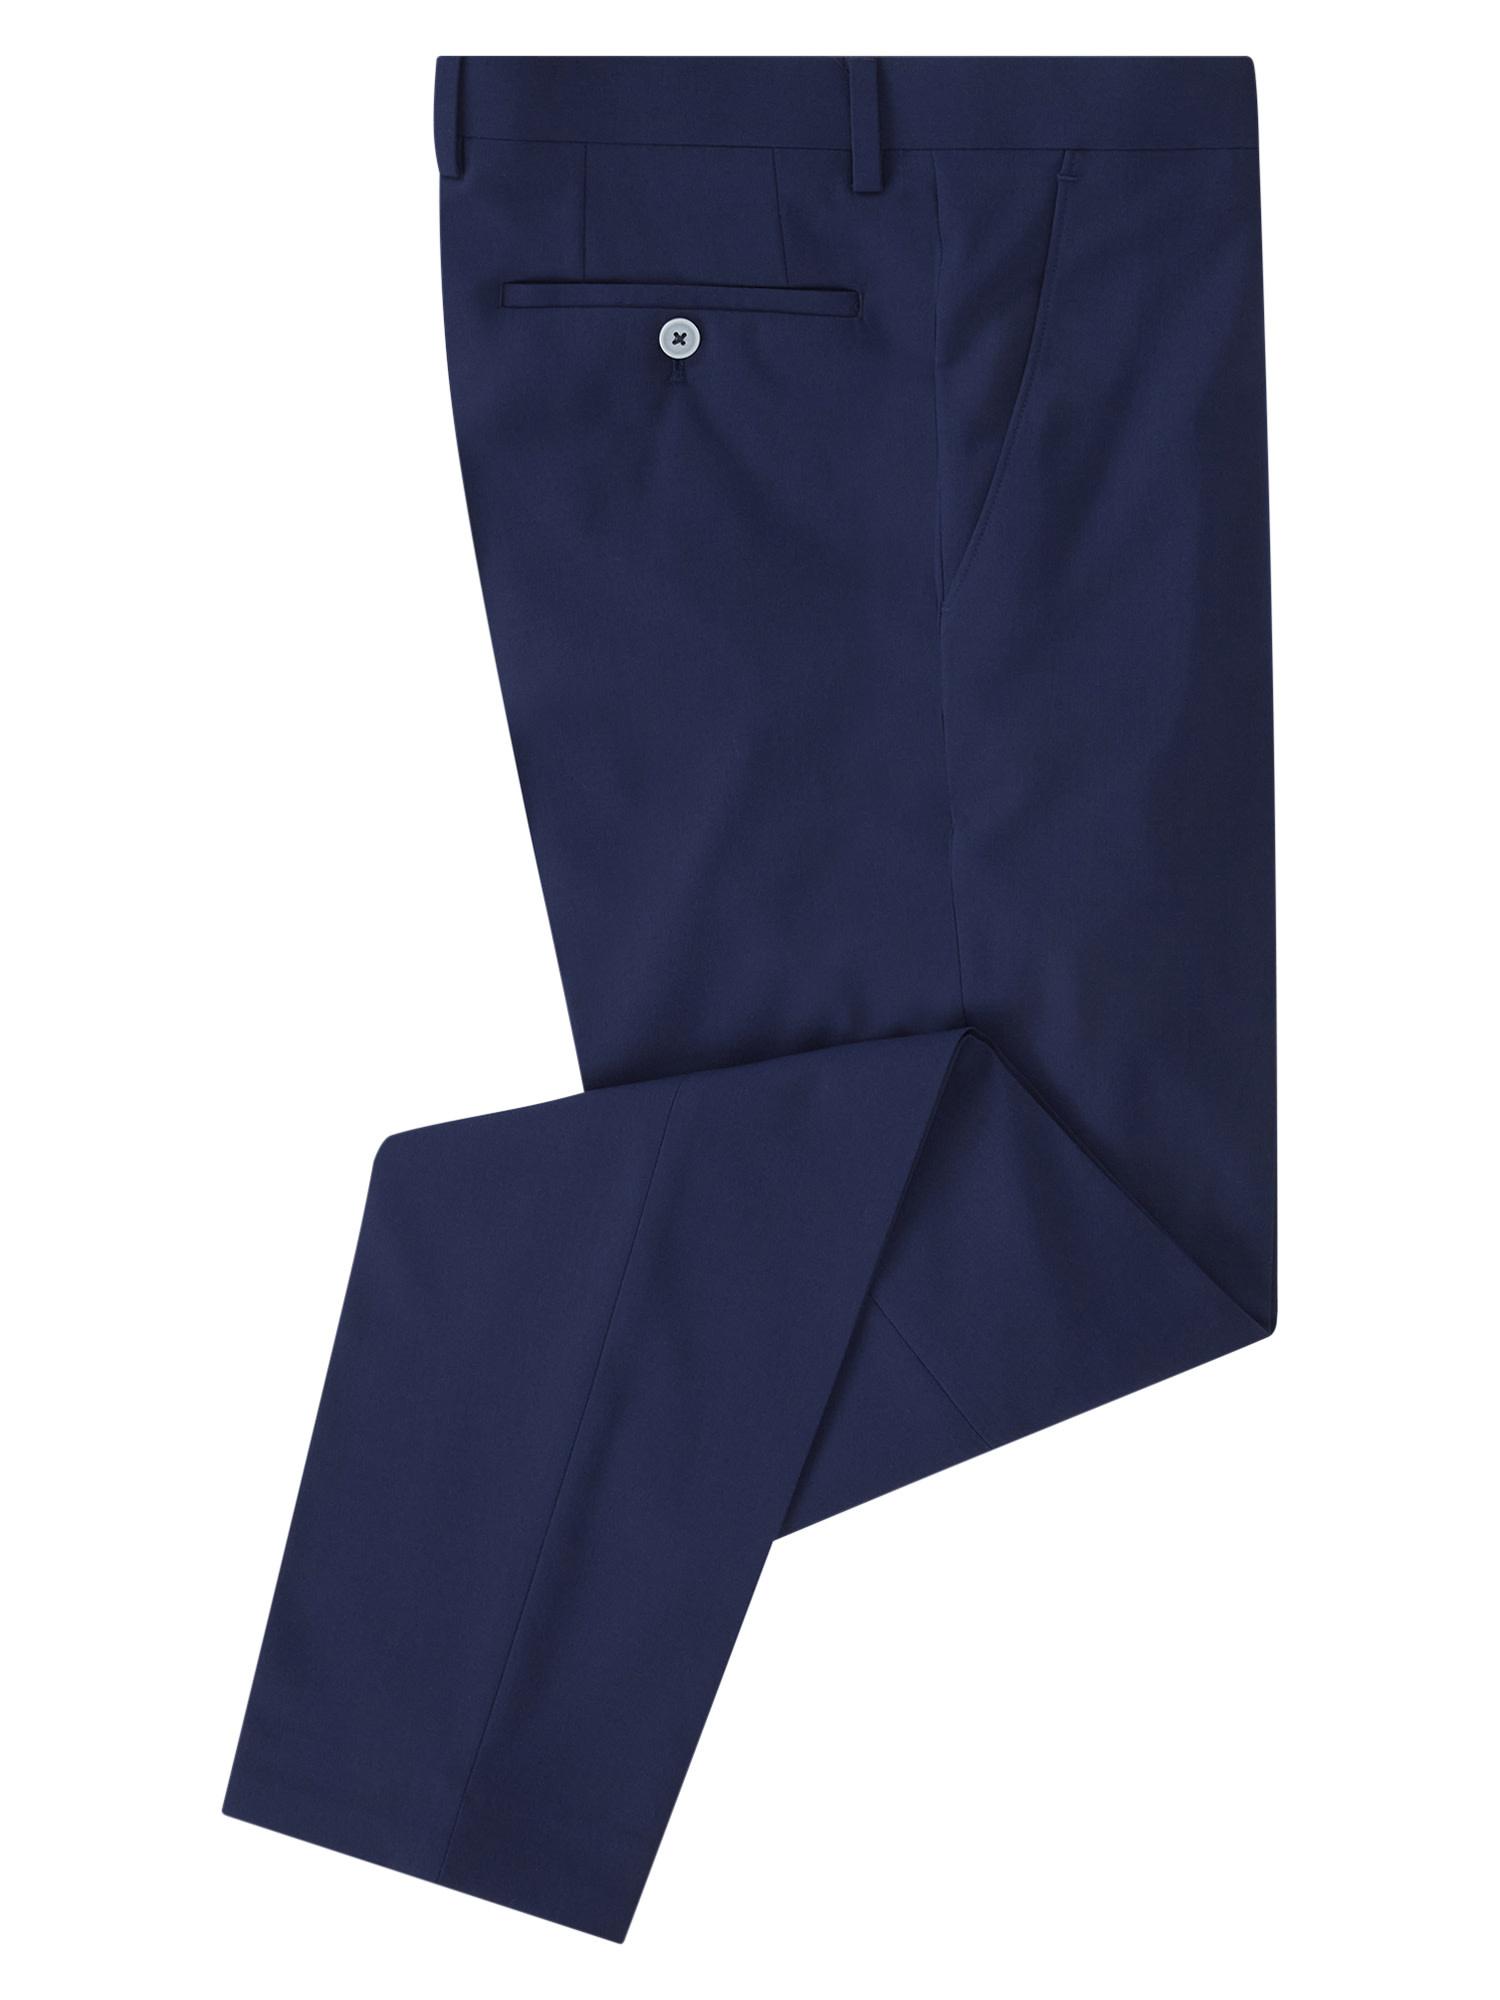 Remus Uomo Grey 3 piece with check jacket